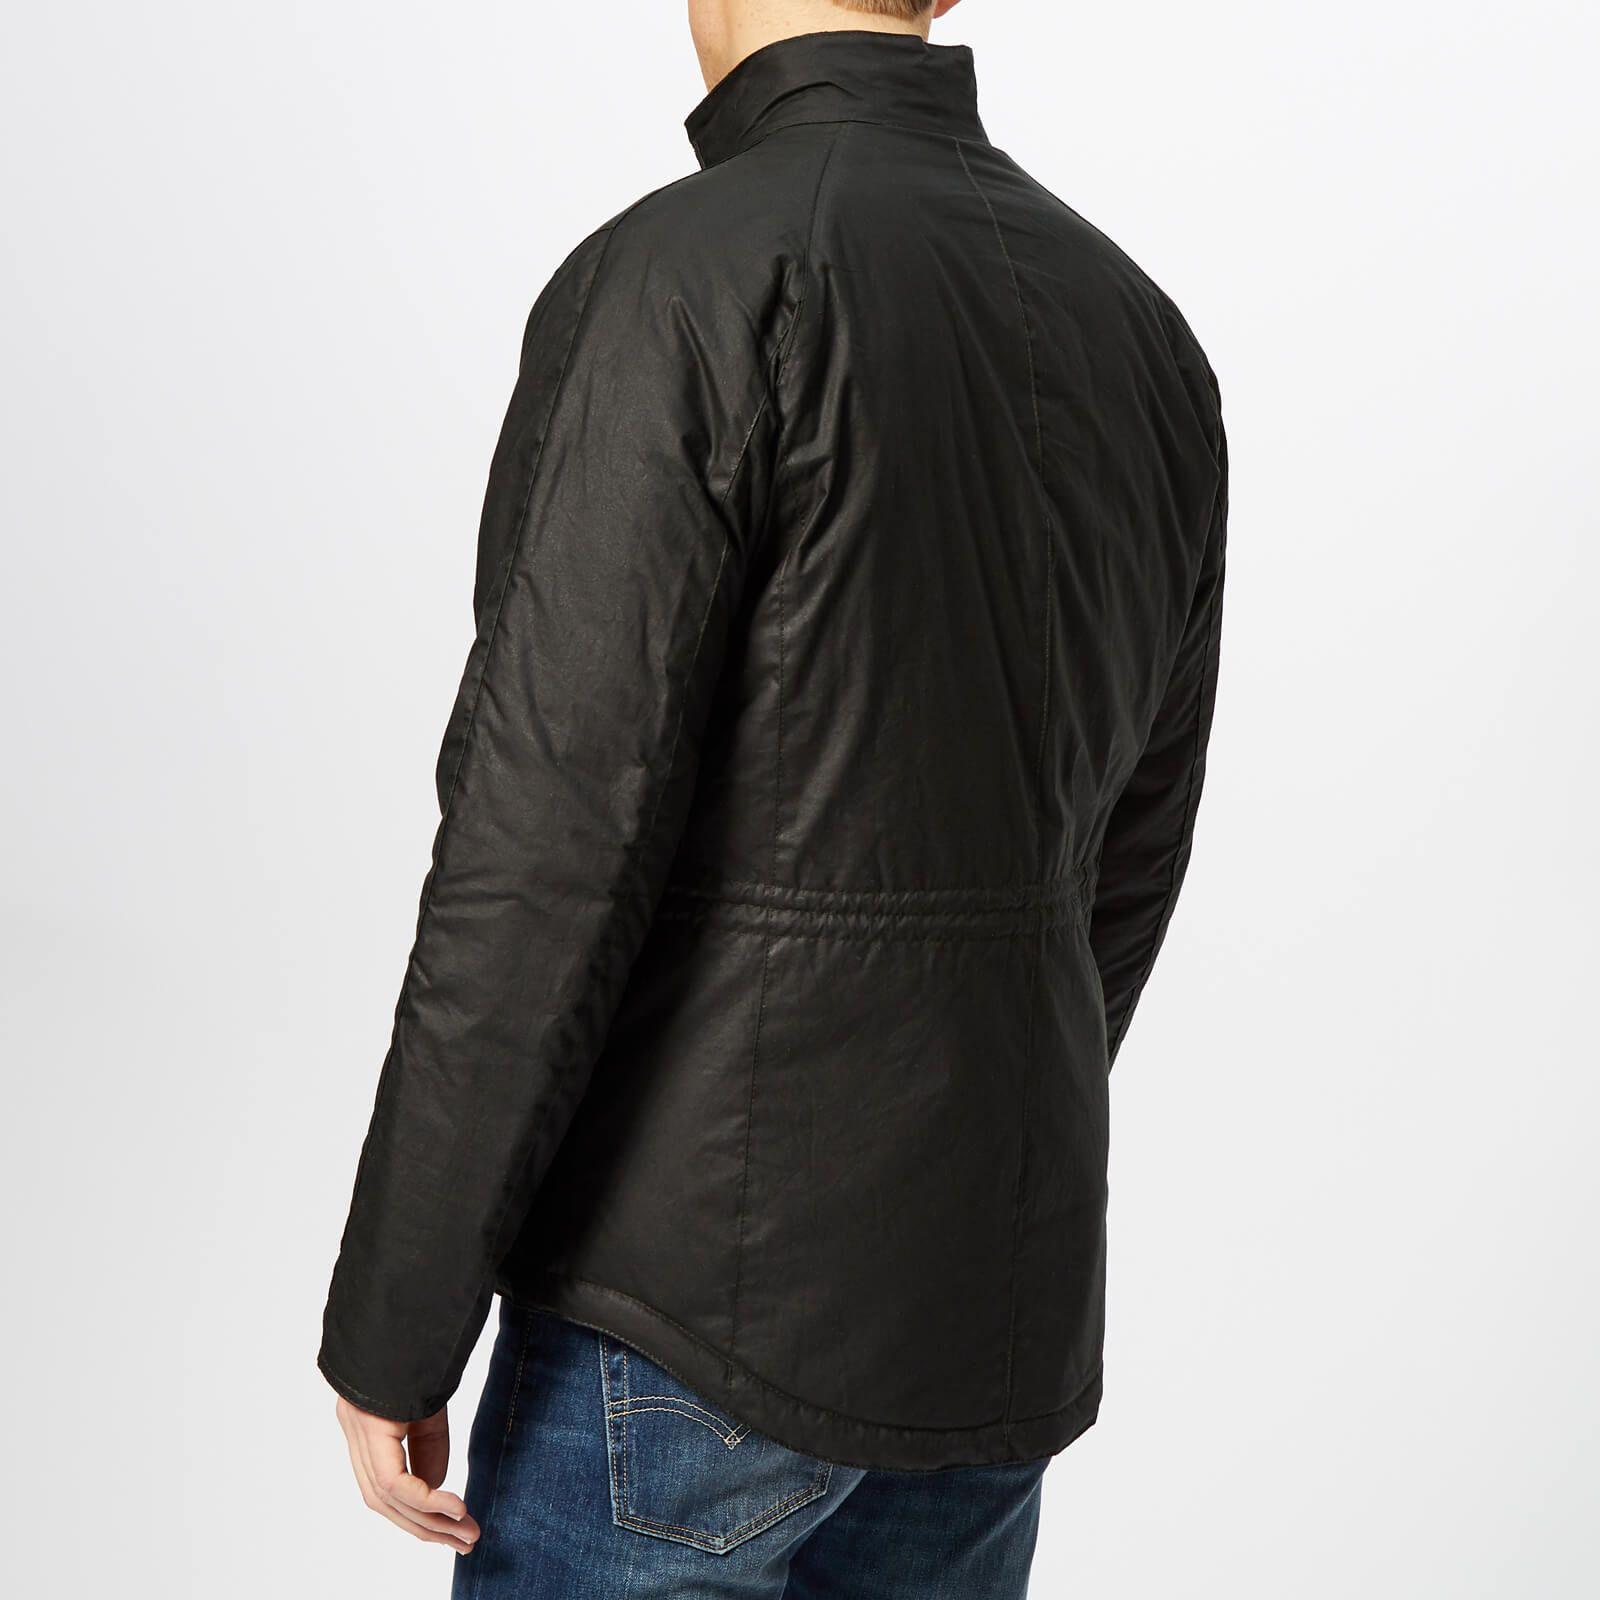 4ae8aeb935 Barbour International Men's Lever Wax Jacket - Sage in 2019 ...